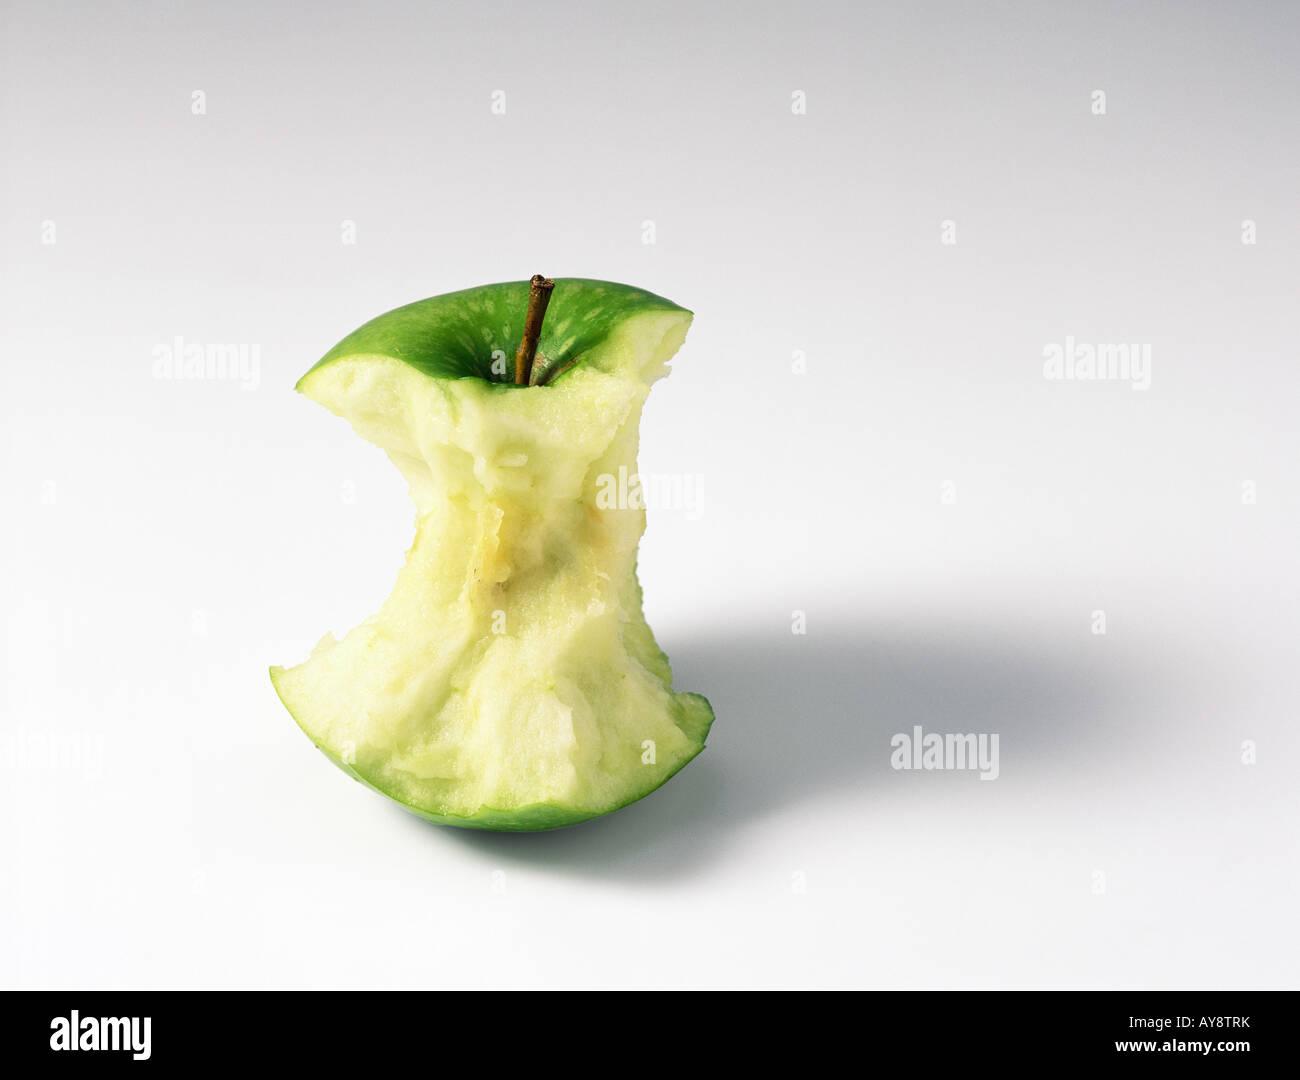 Apple core, close-up - Stock Image